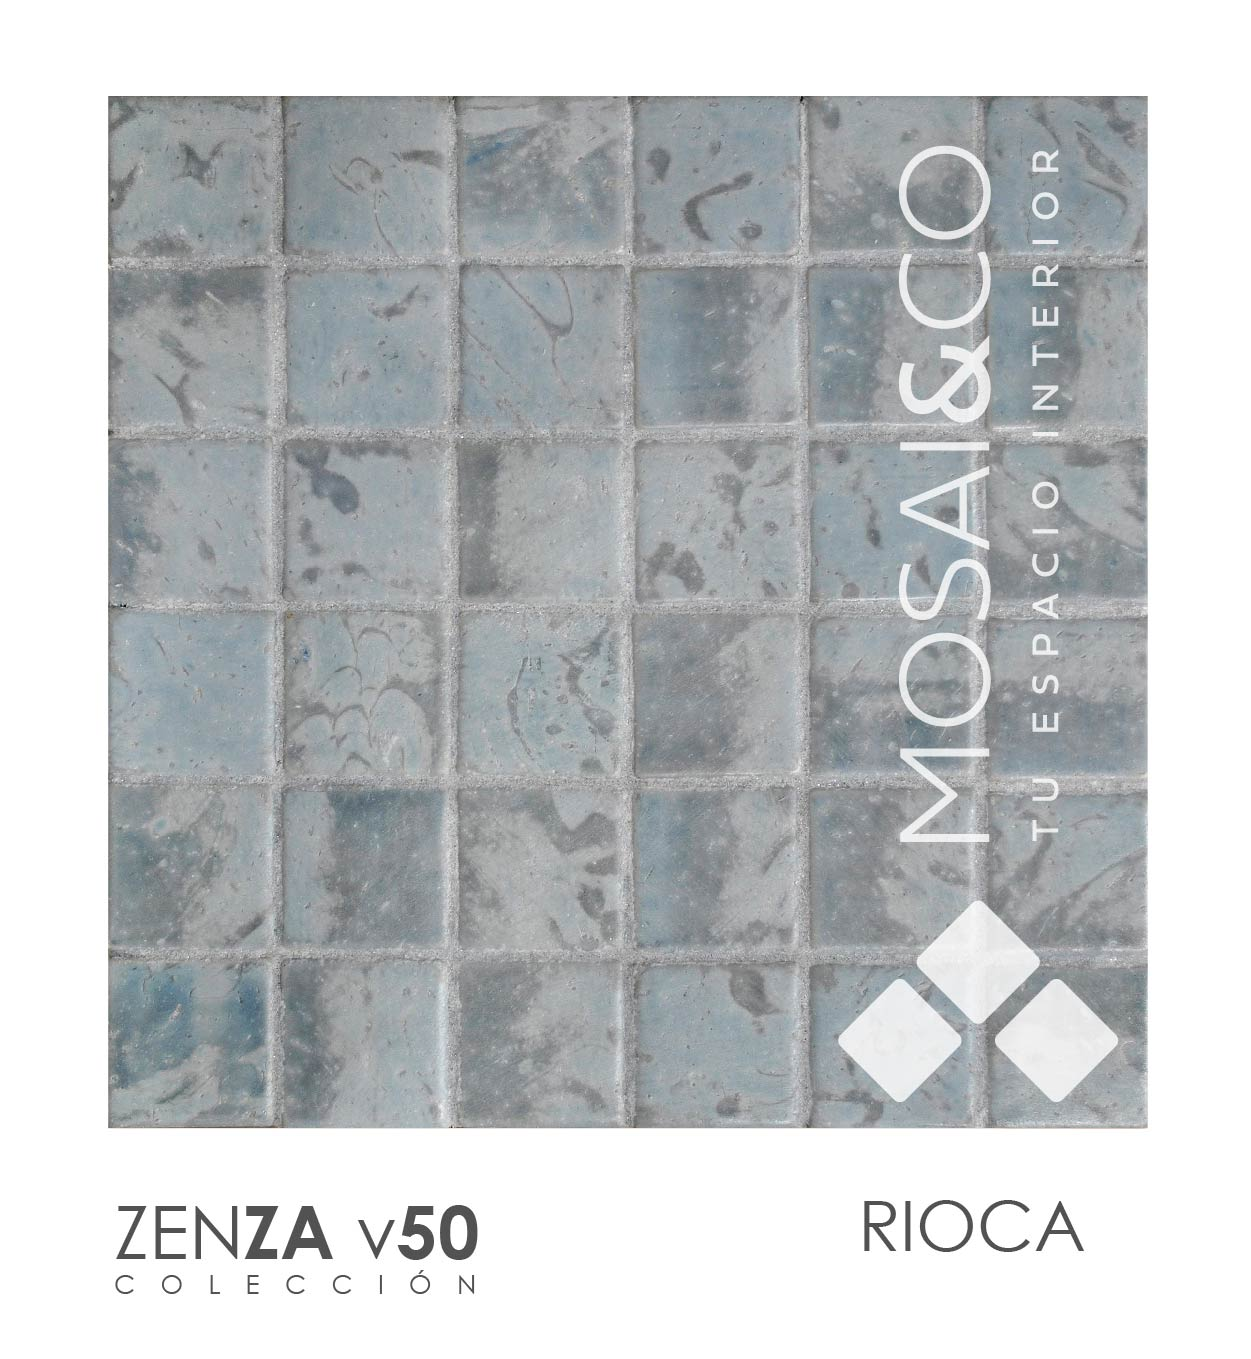 mosaico-decoracion-interiores-mosaiandco-coleccion-zenza-v50_rioca